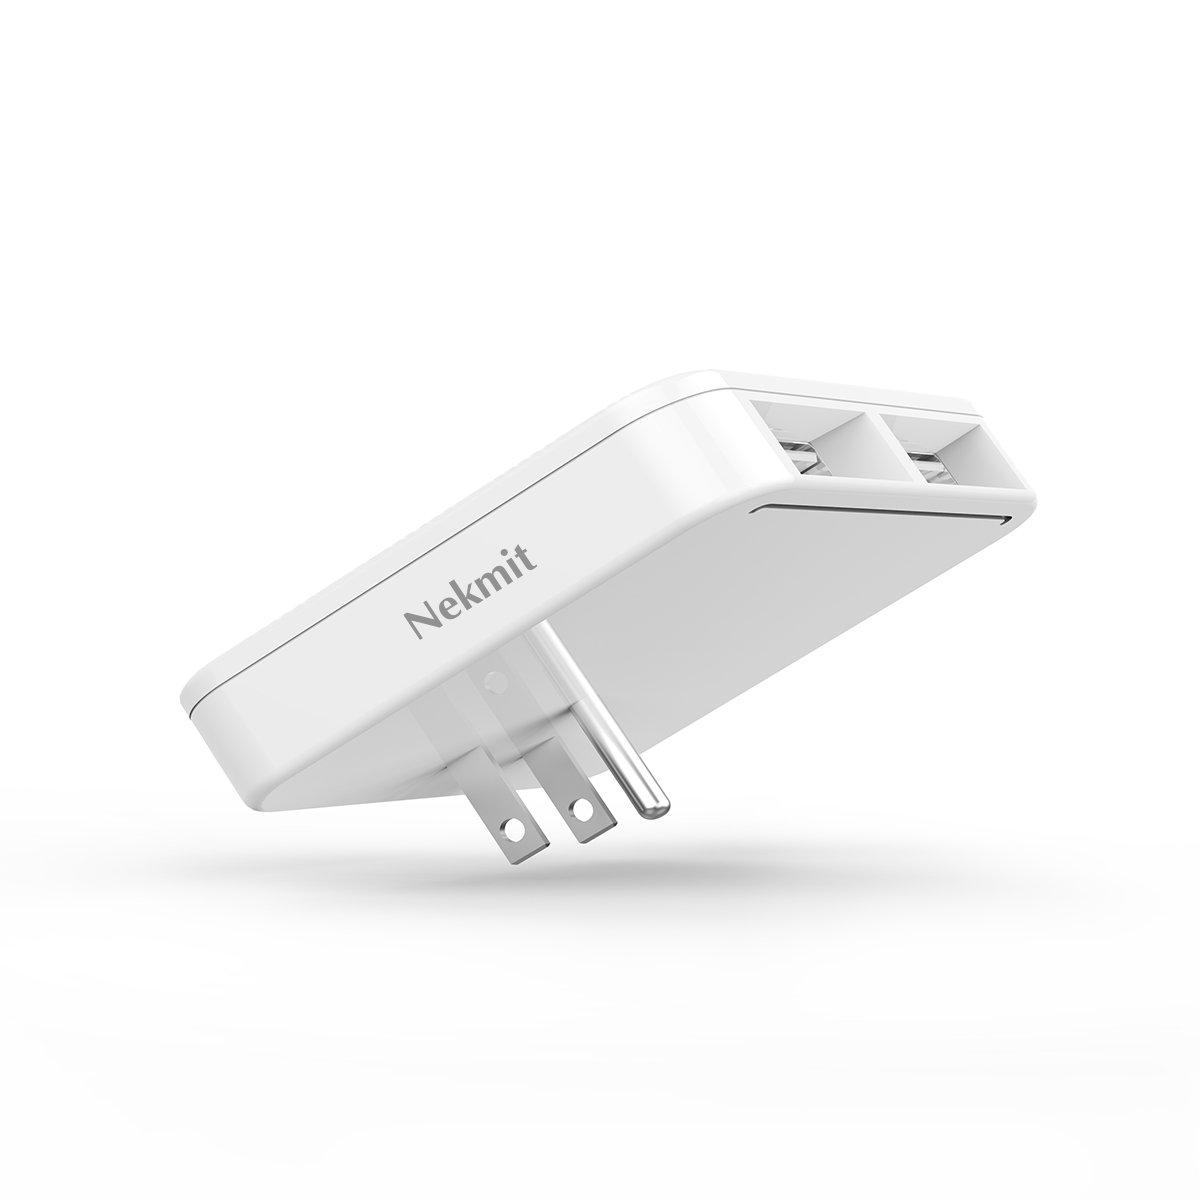 Nekmit Dual Port Ultra Thin Flat USB Wall Charger with Smart IC by Nekmit (Image #3)